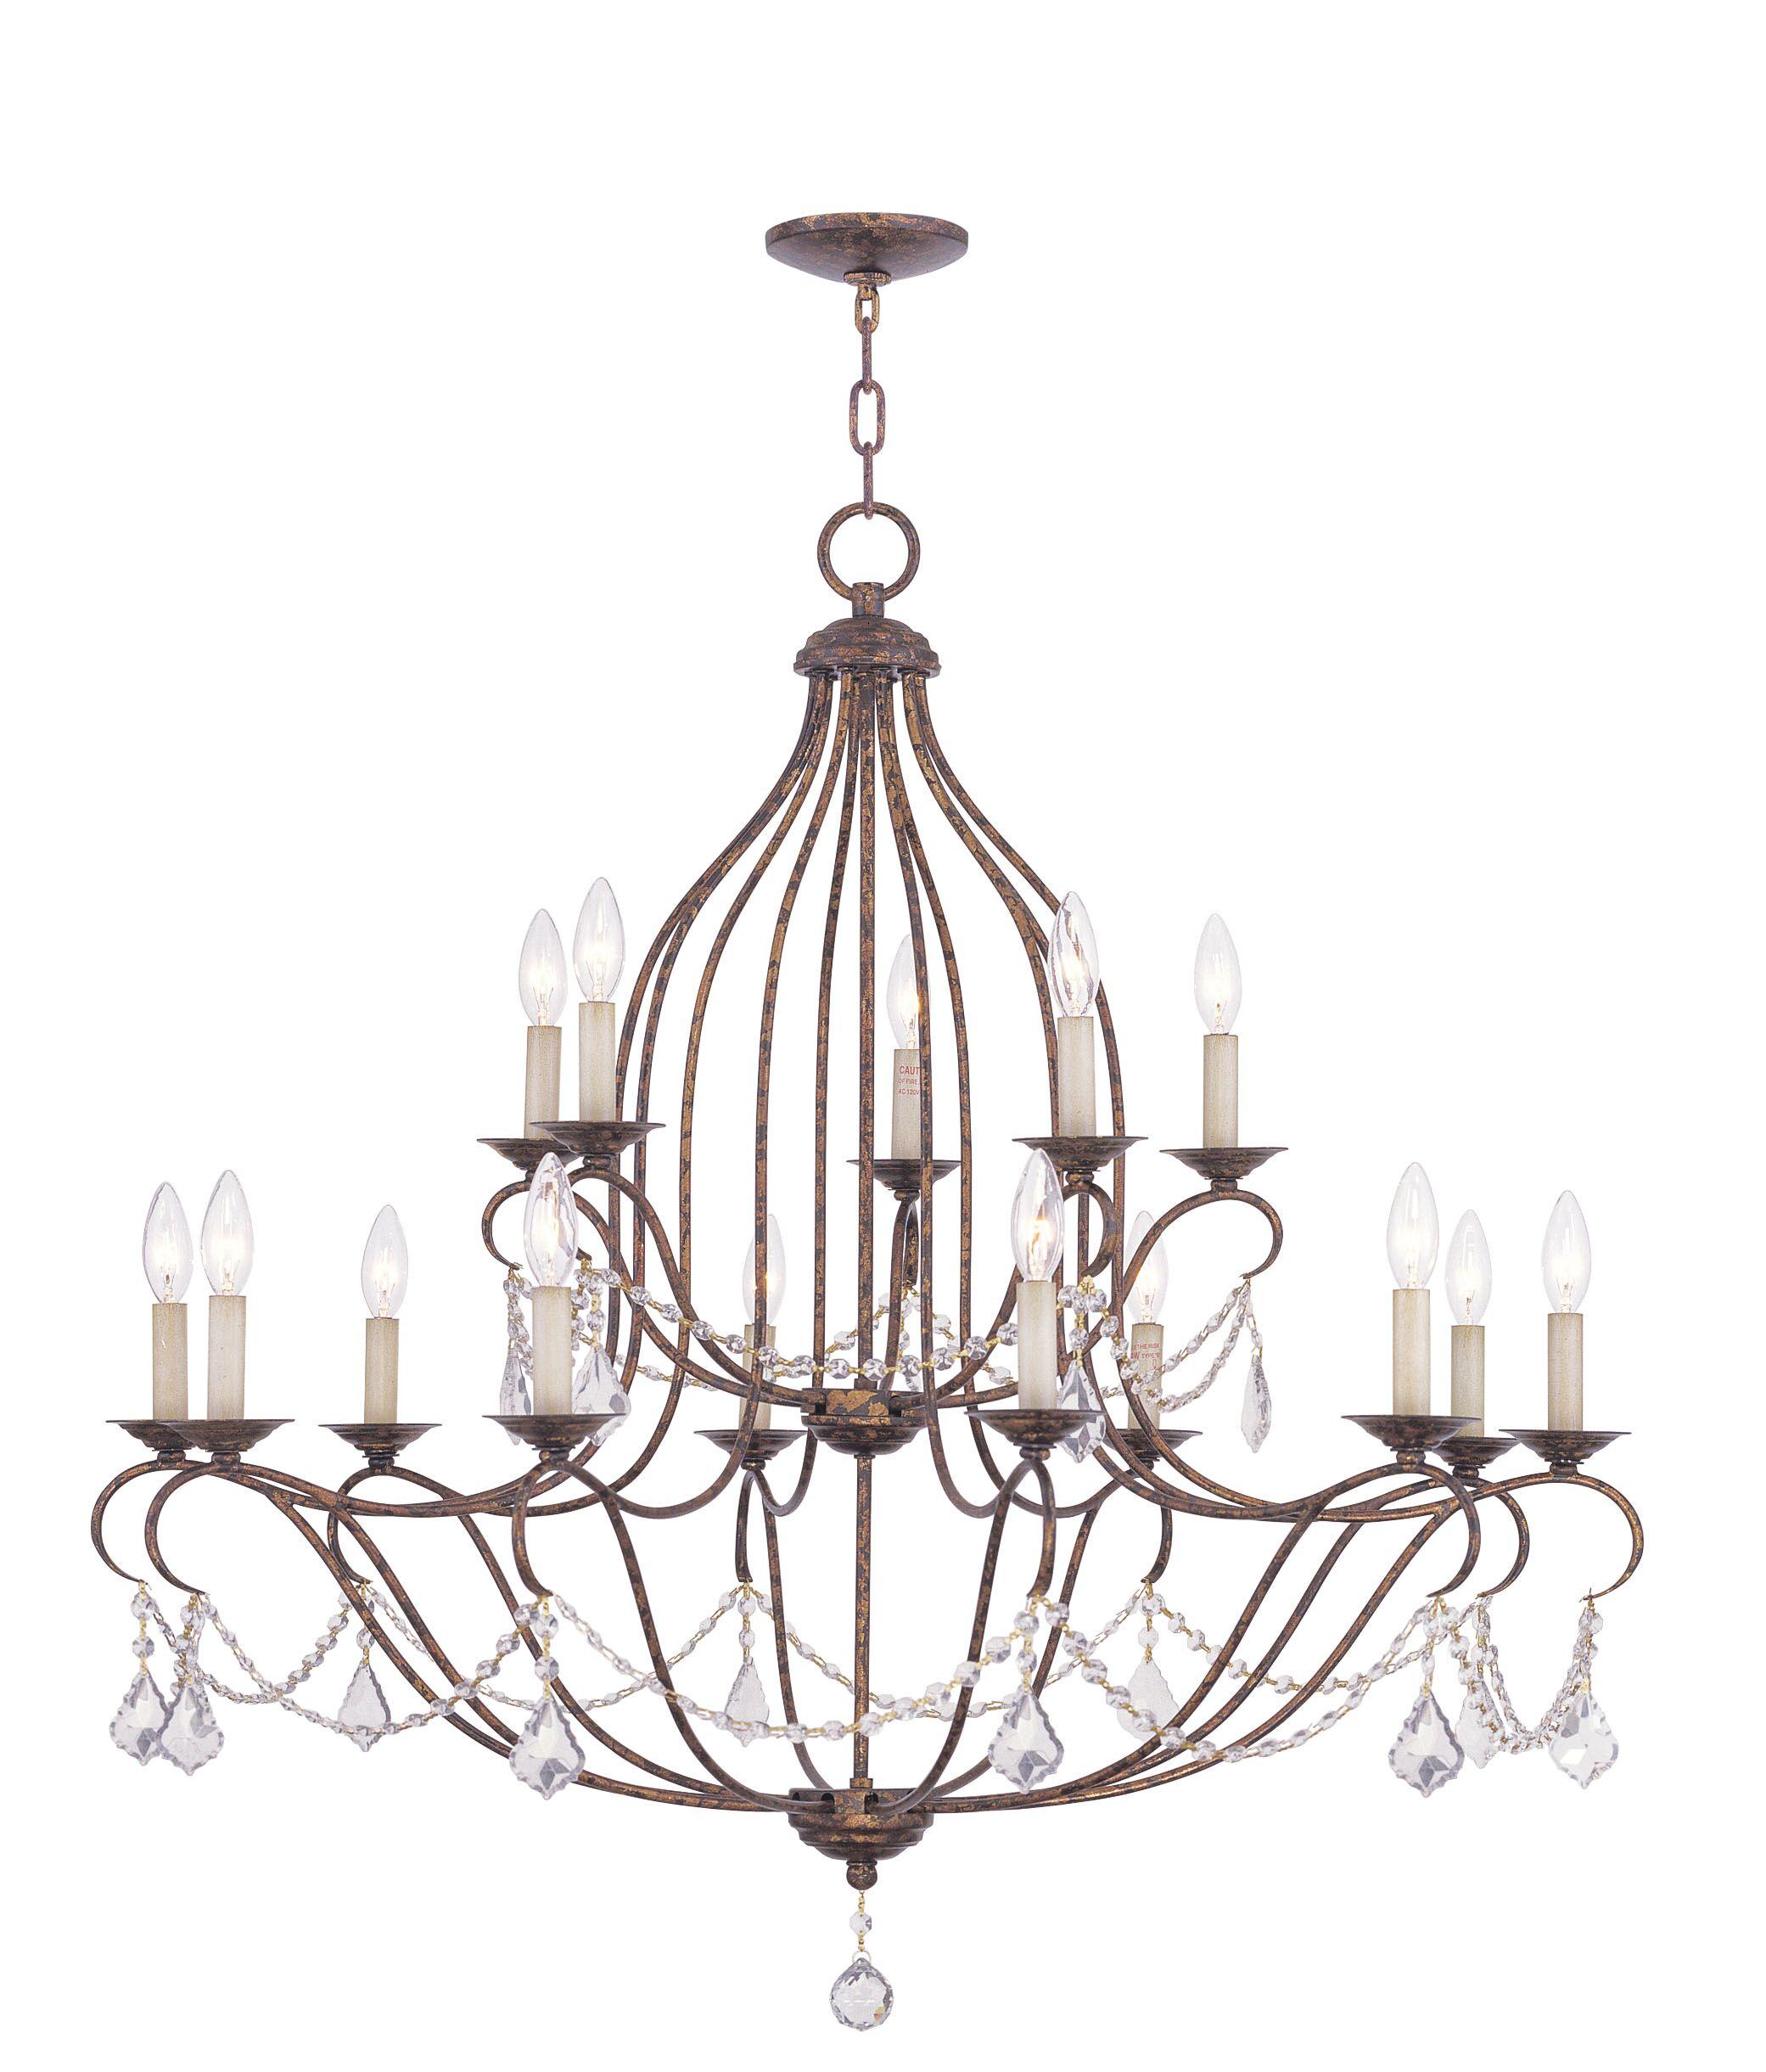 Bayfront 15-Light Candle Style Chandelier Color: Venetian Golden Bronze